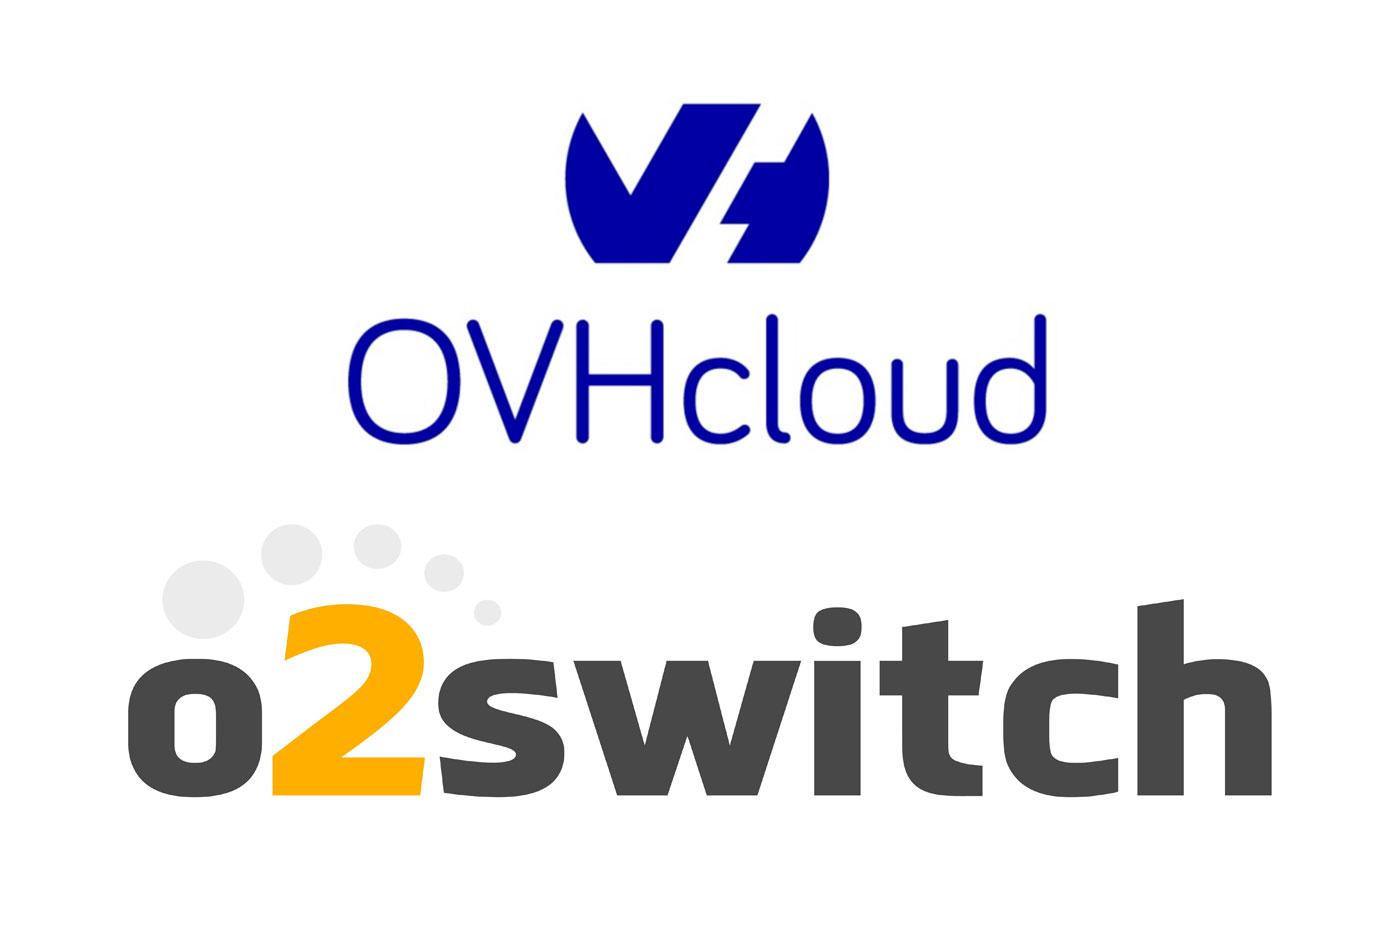 OVH O2switch